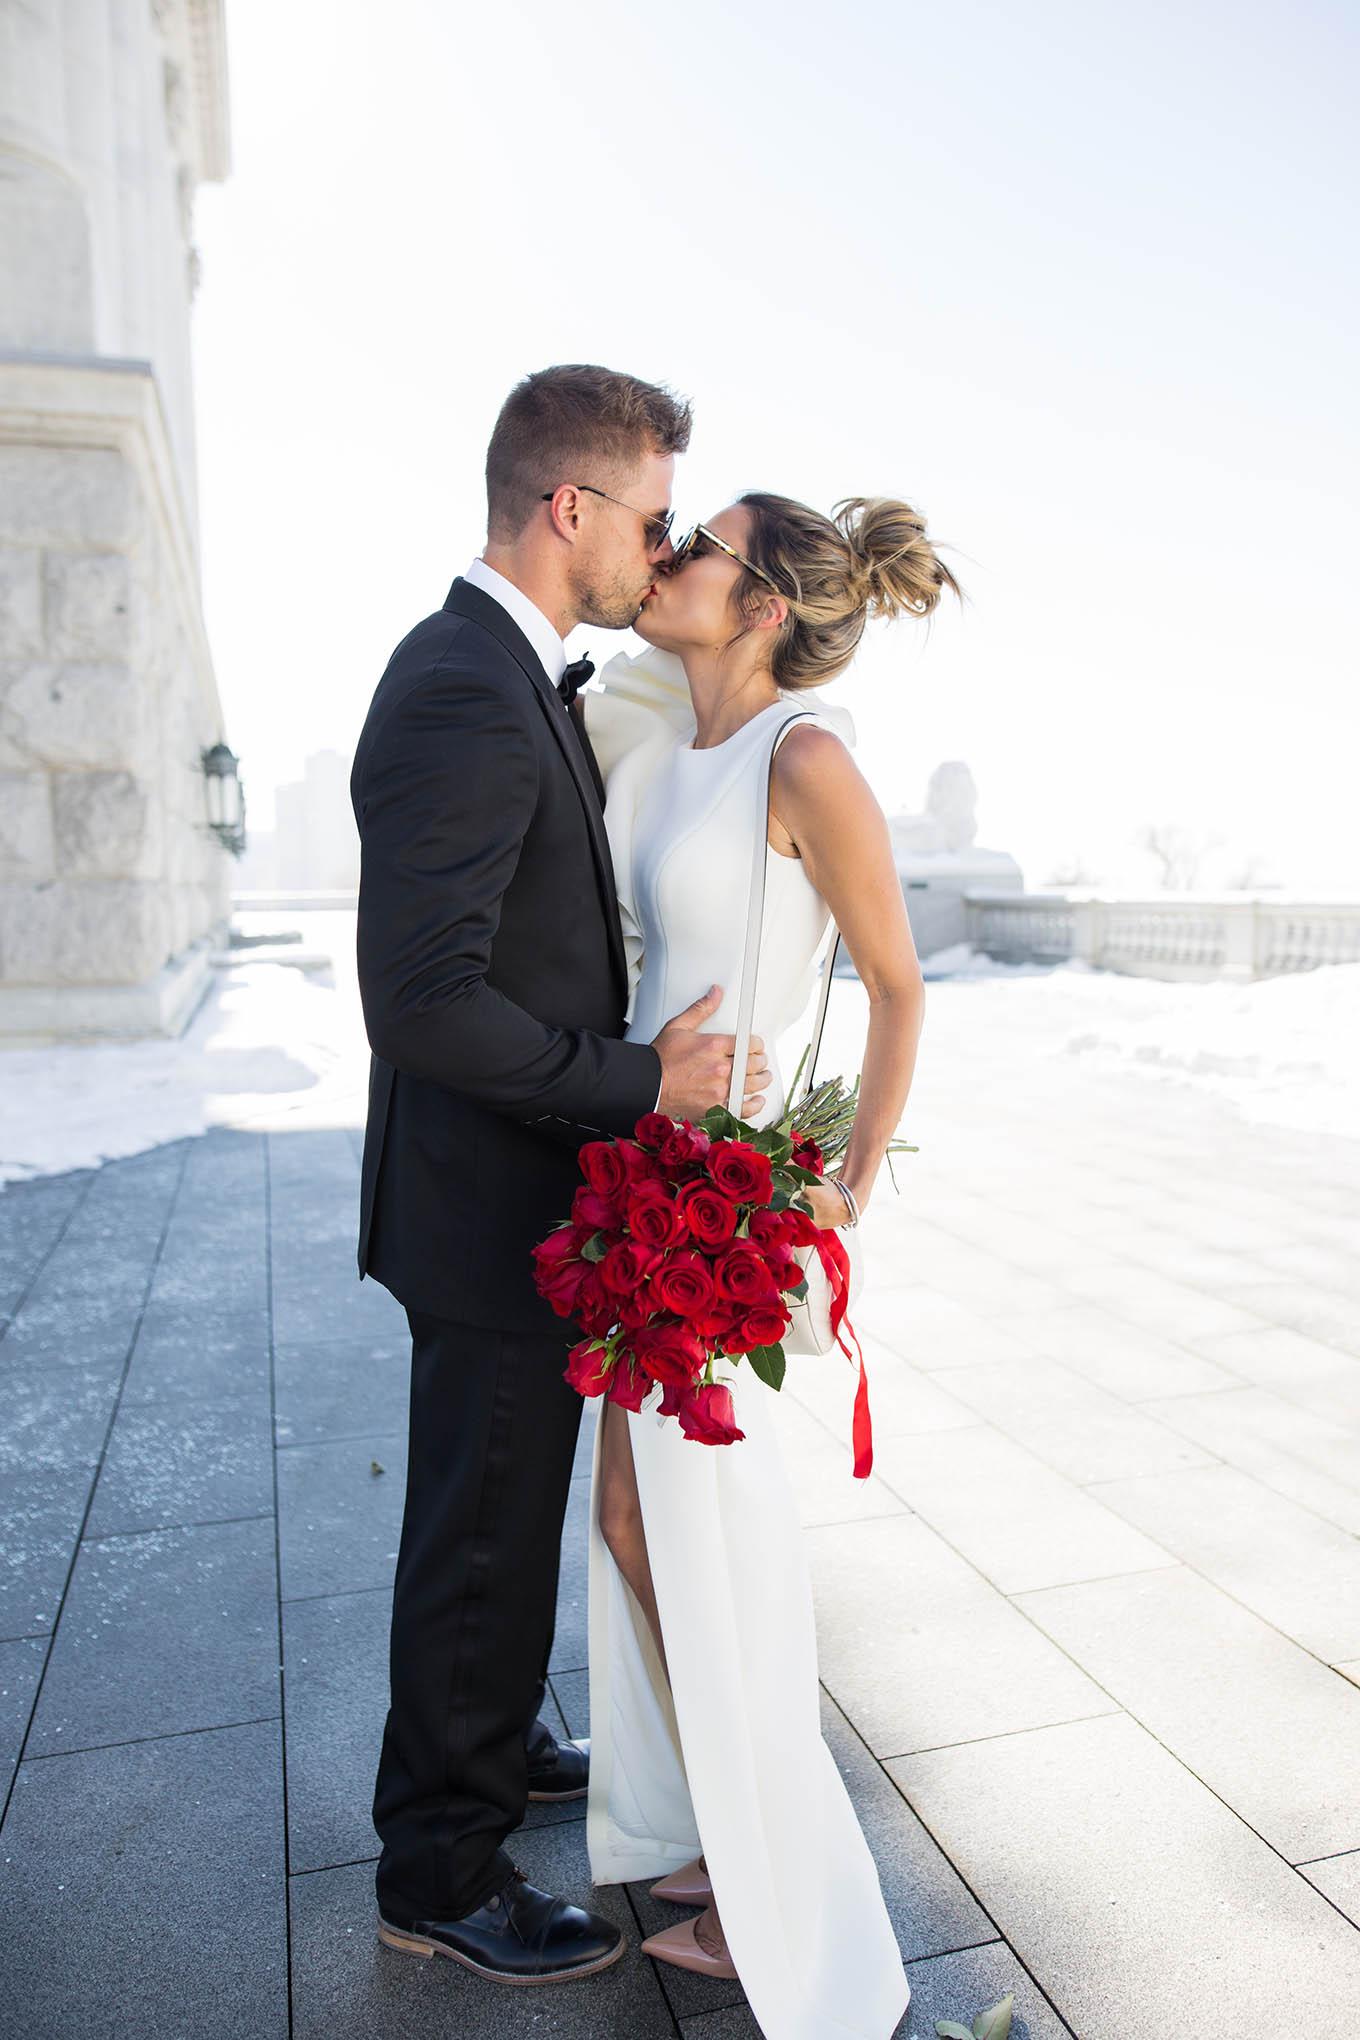 valentine's date dress ideas